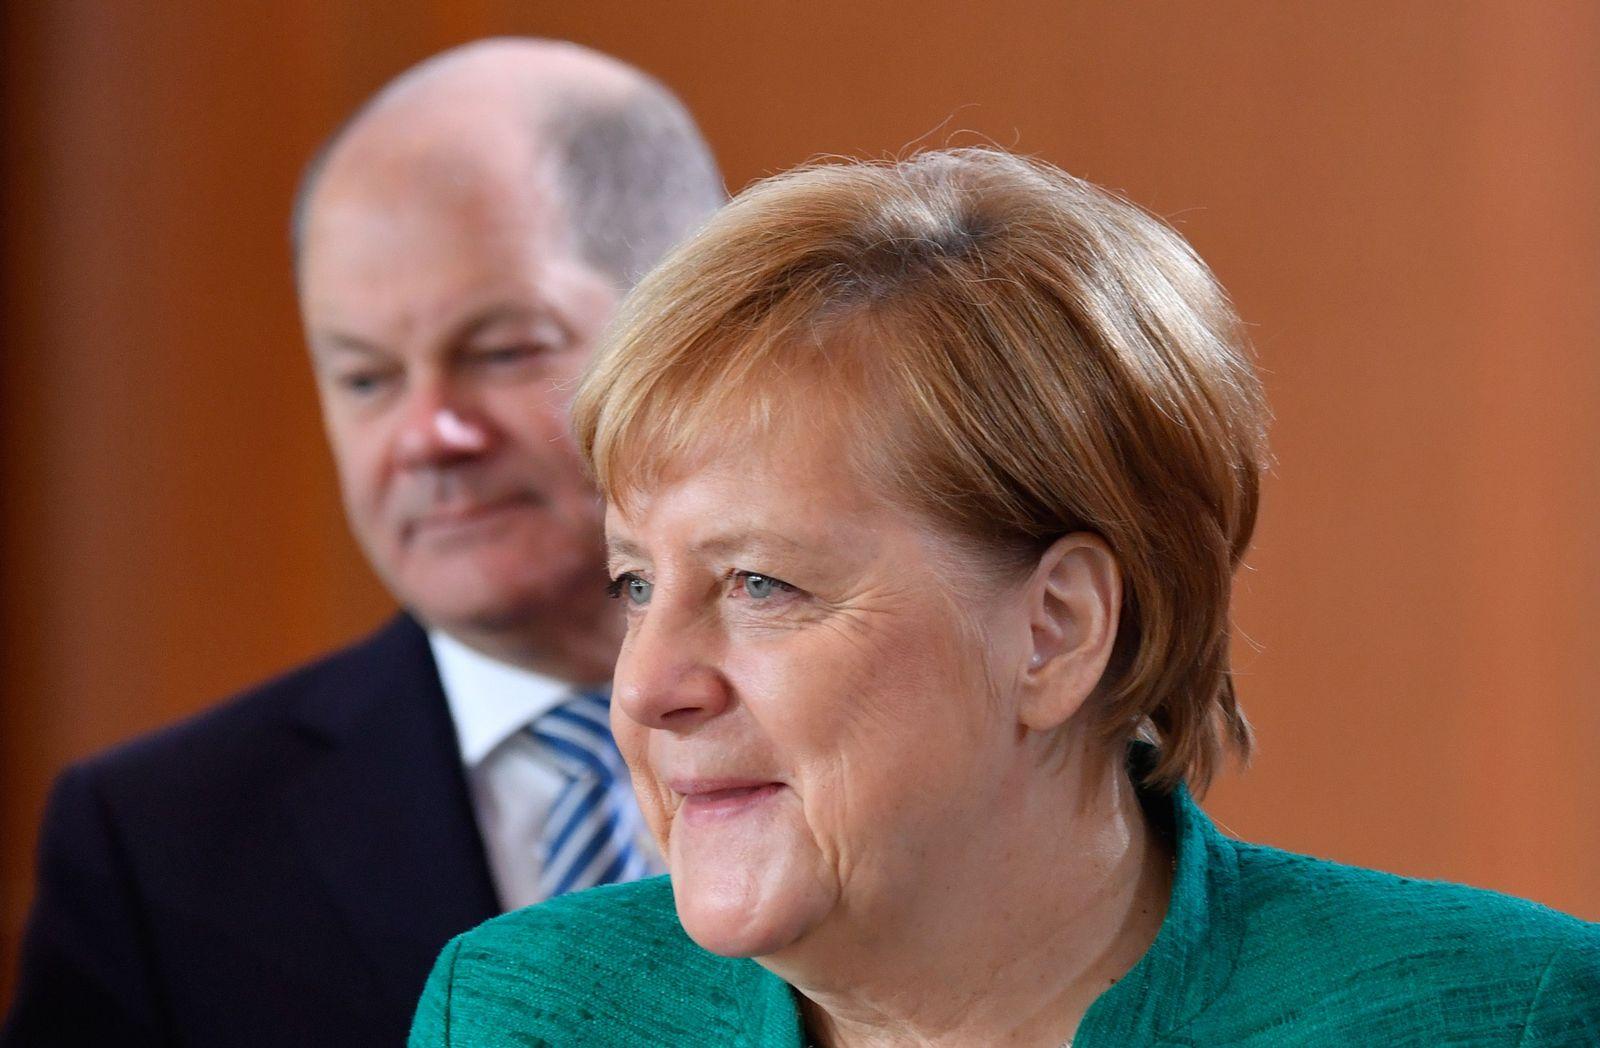 Olaf Scholz / Angela Merkel